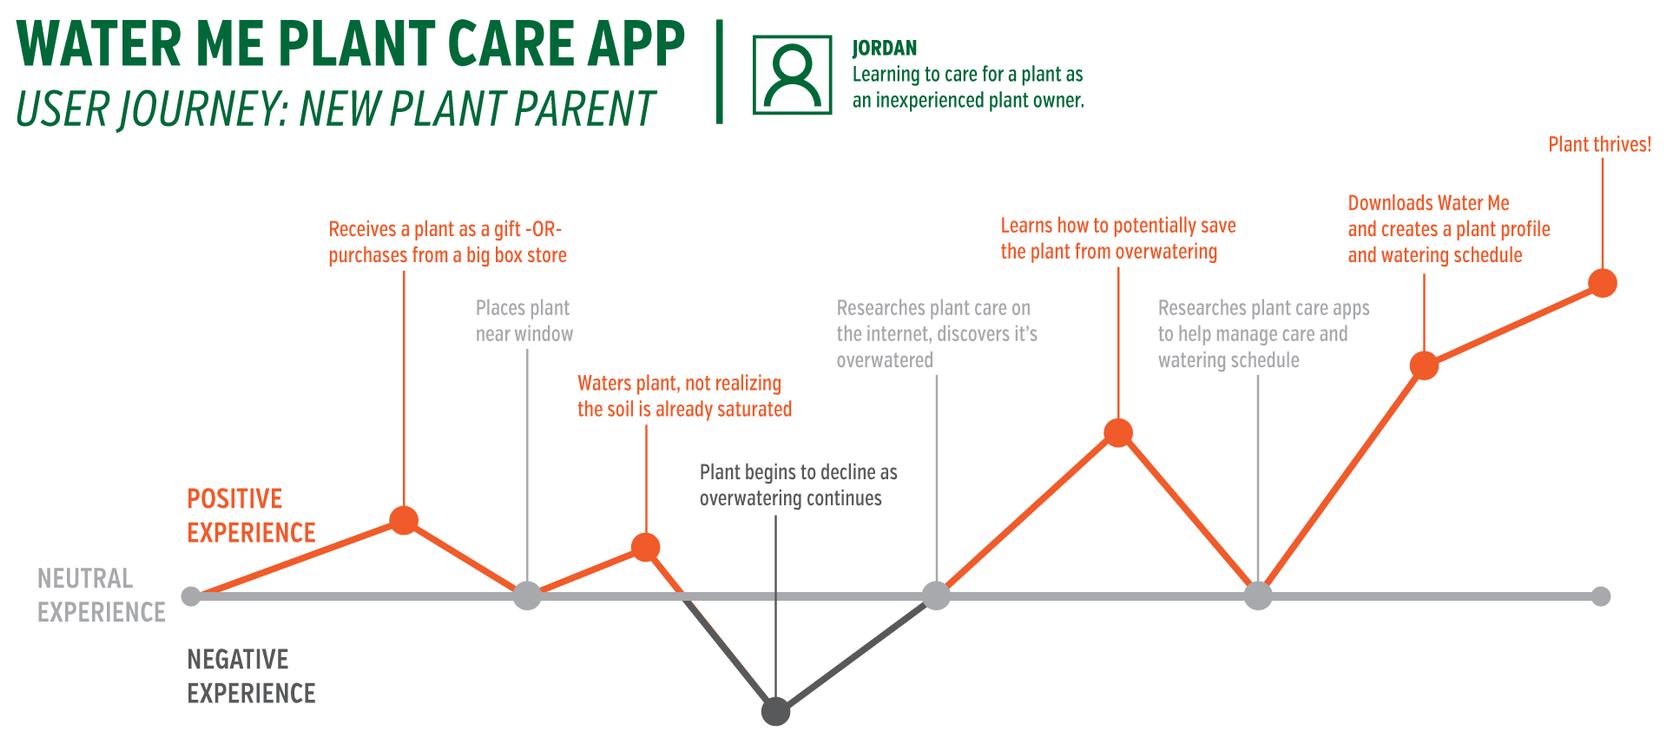 Illustrated User Journey: New Plant Parent